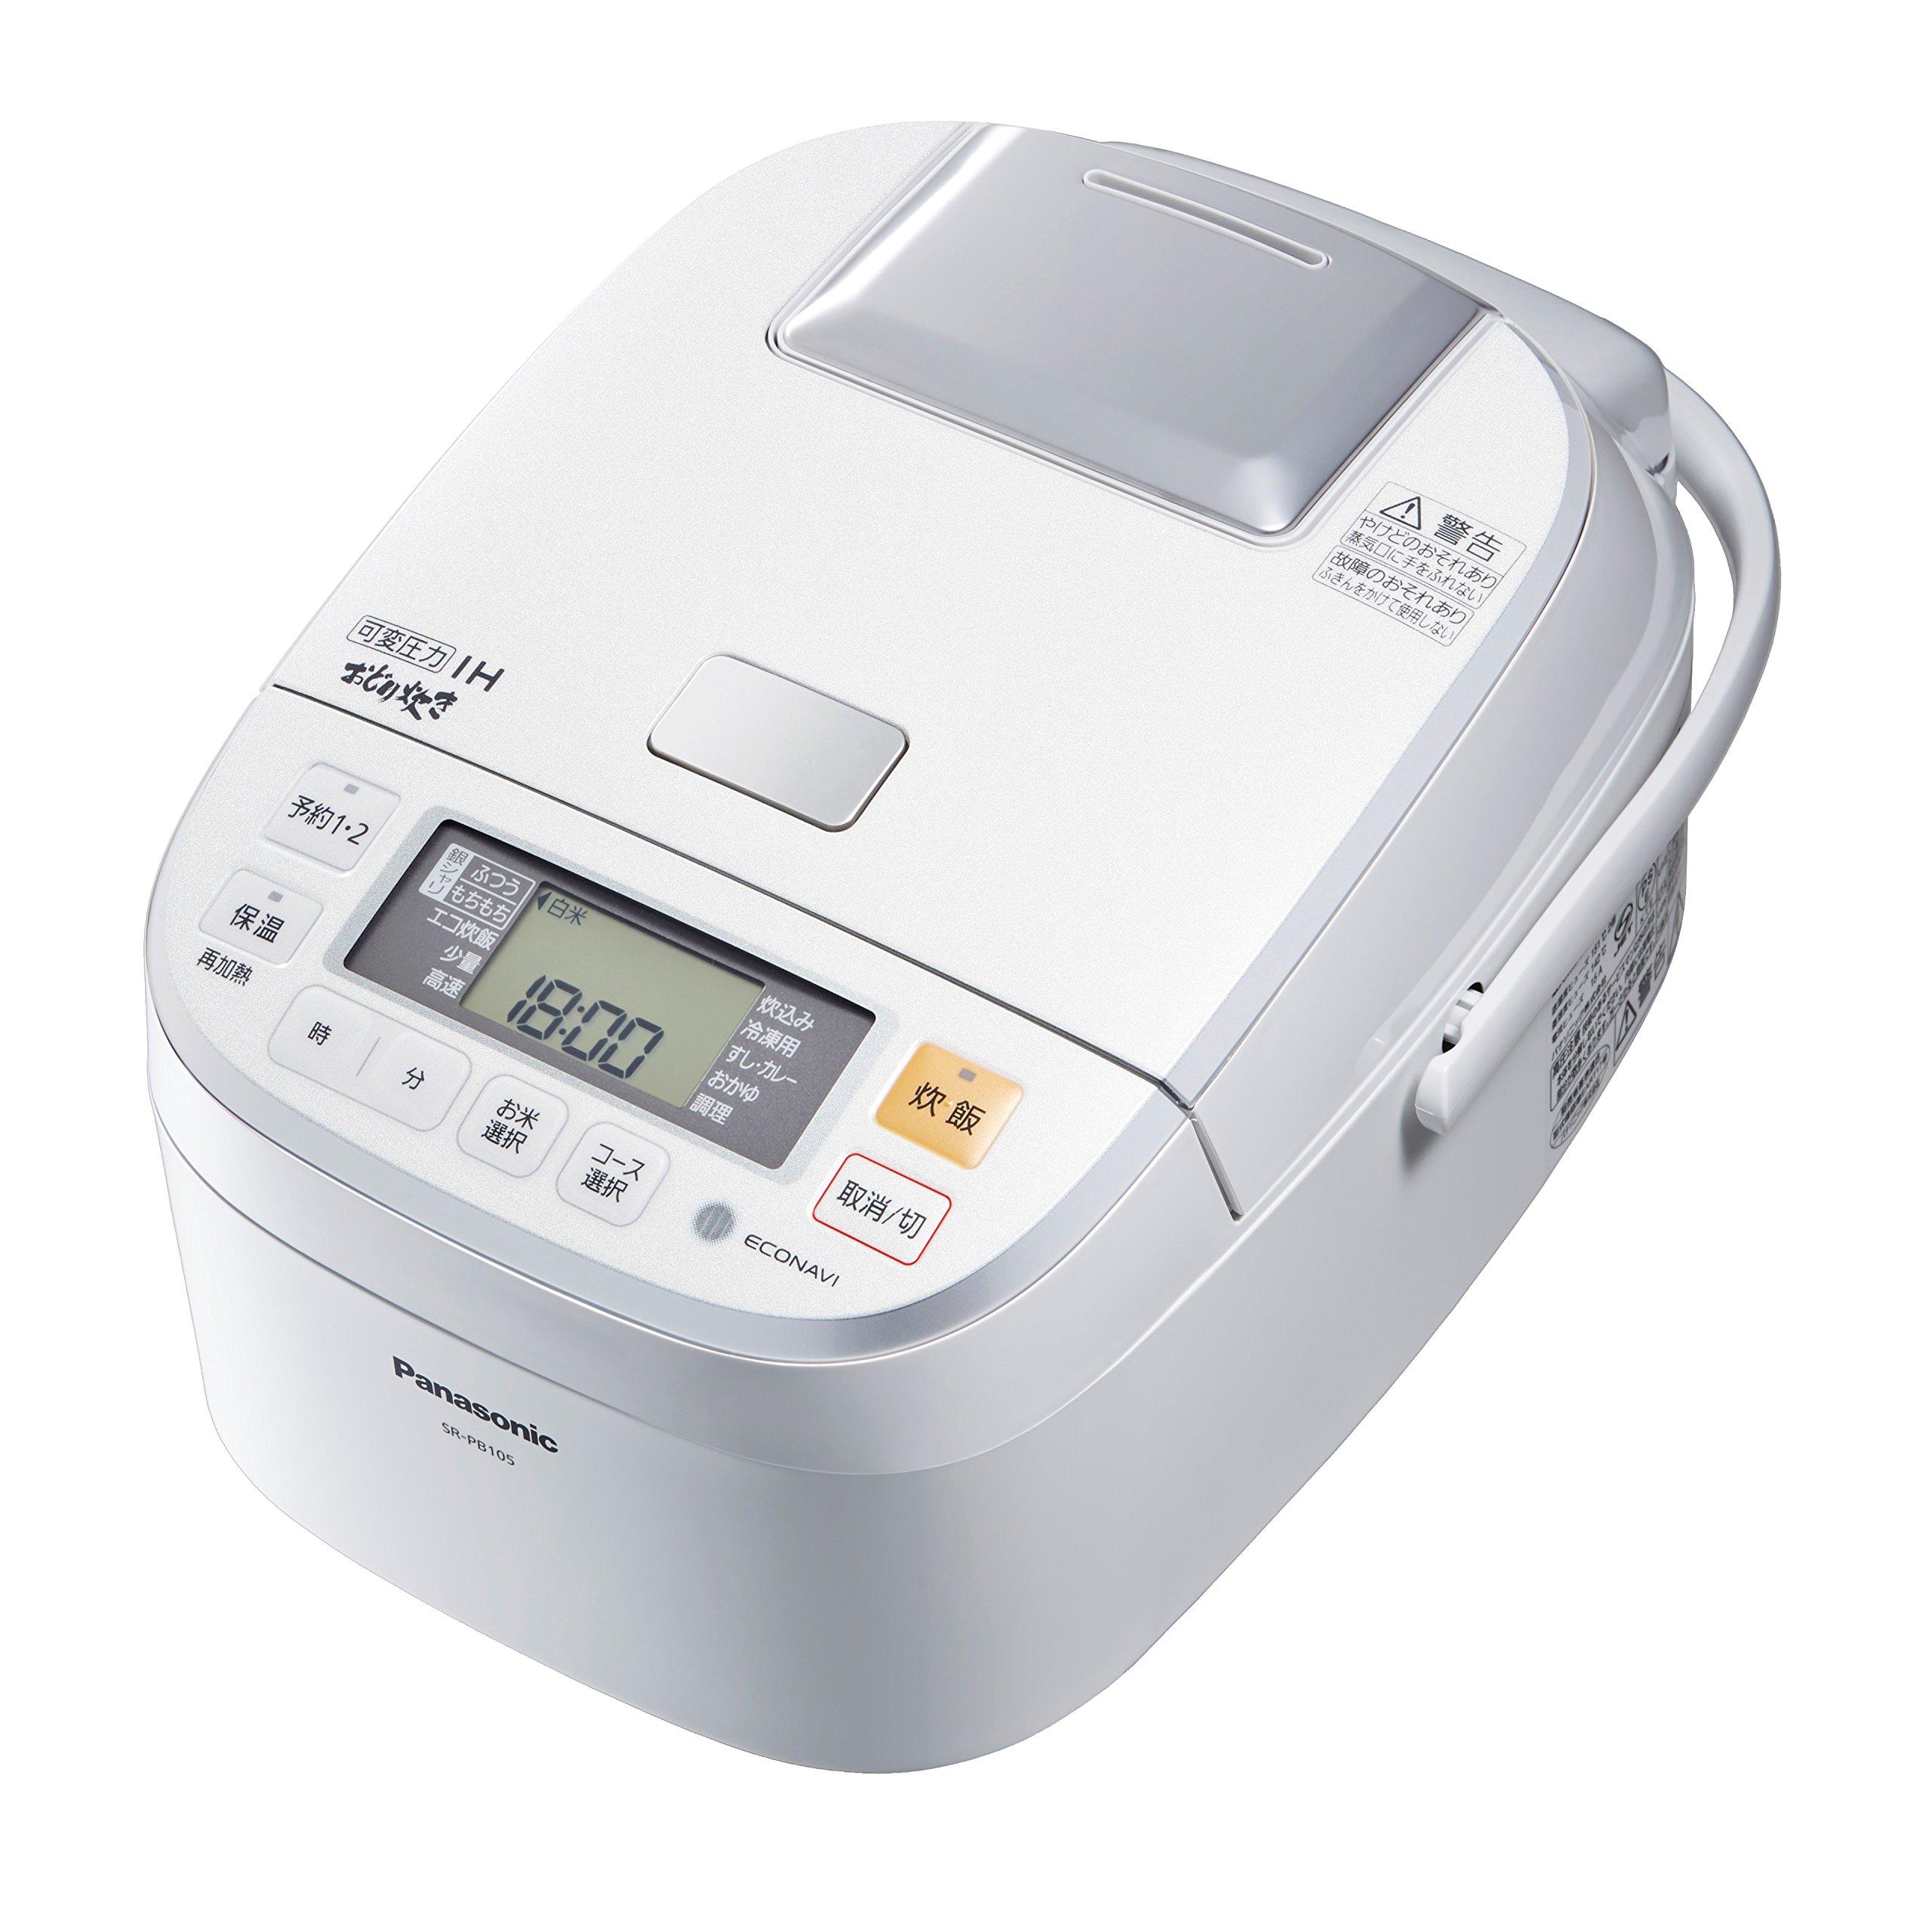 Panasonic variable pressure IH rice cooker (5.5 Go cook) White dance cook SR-PB105-W